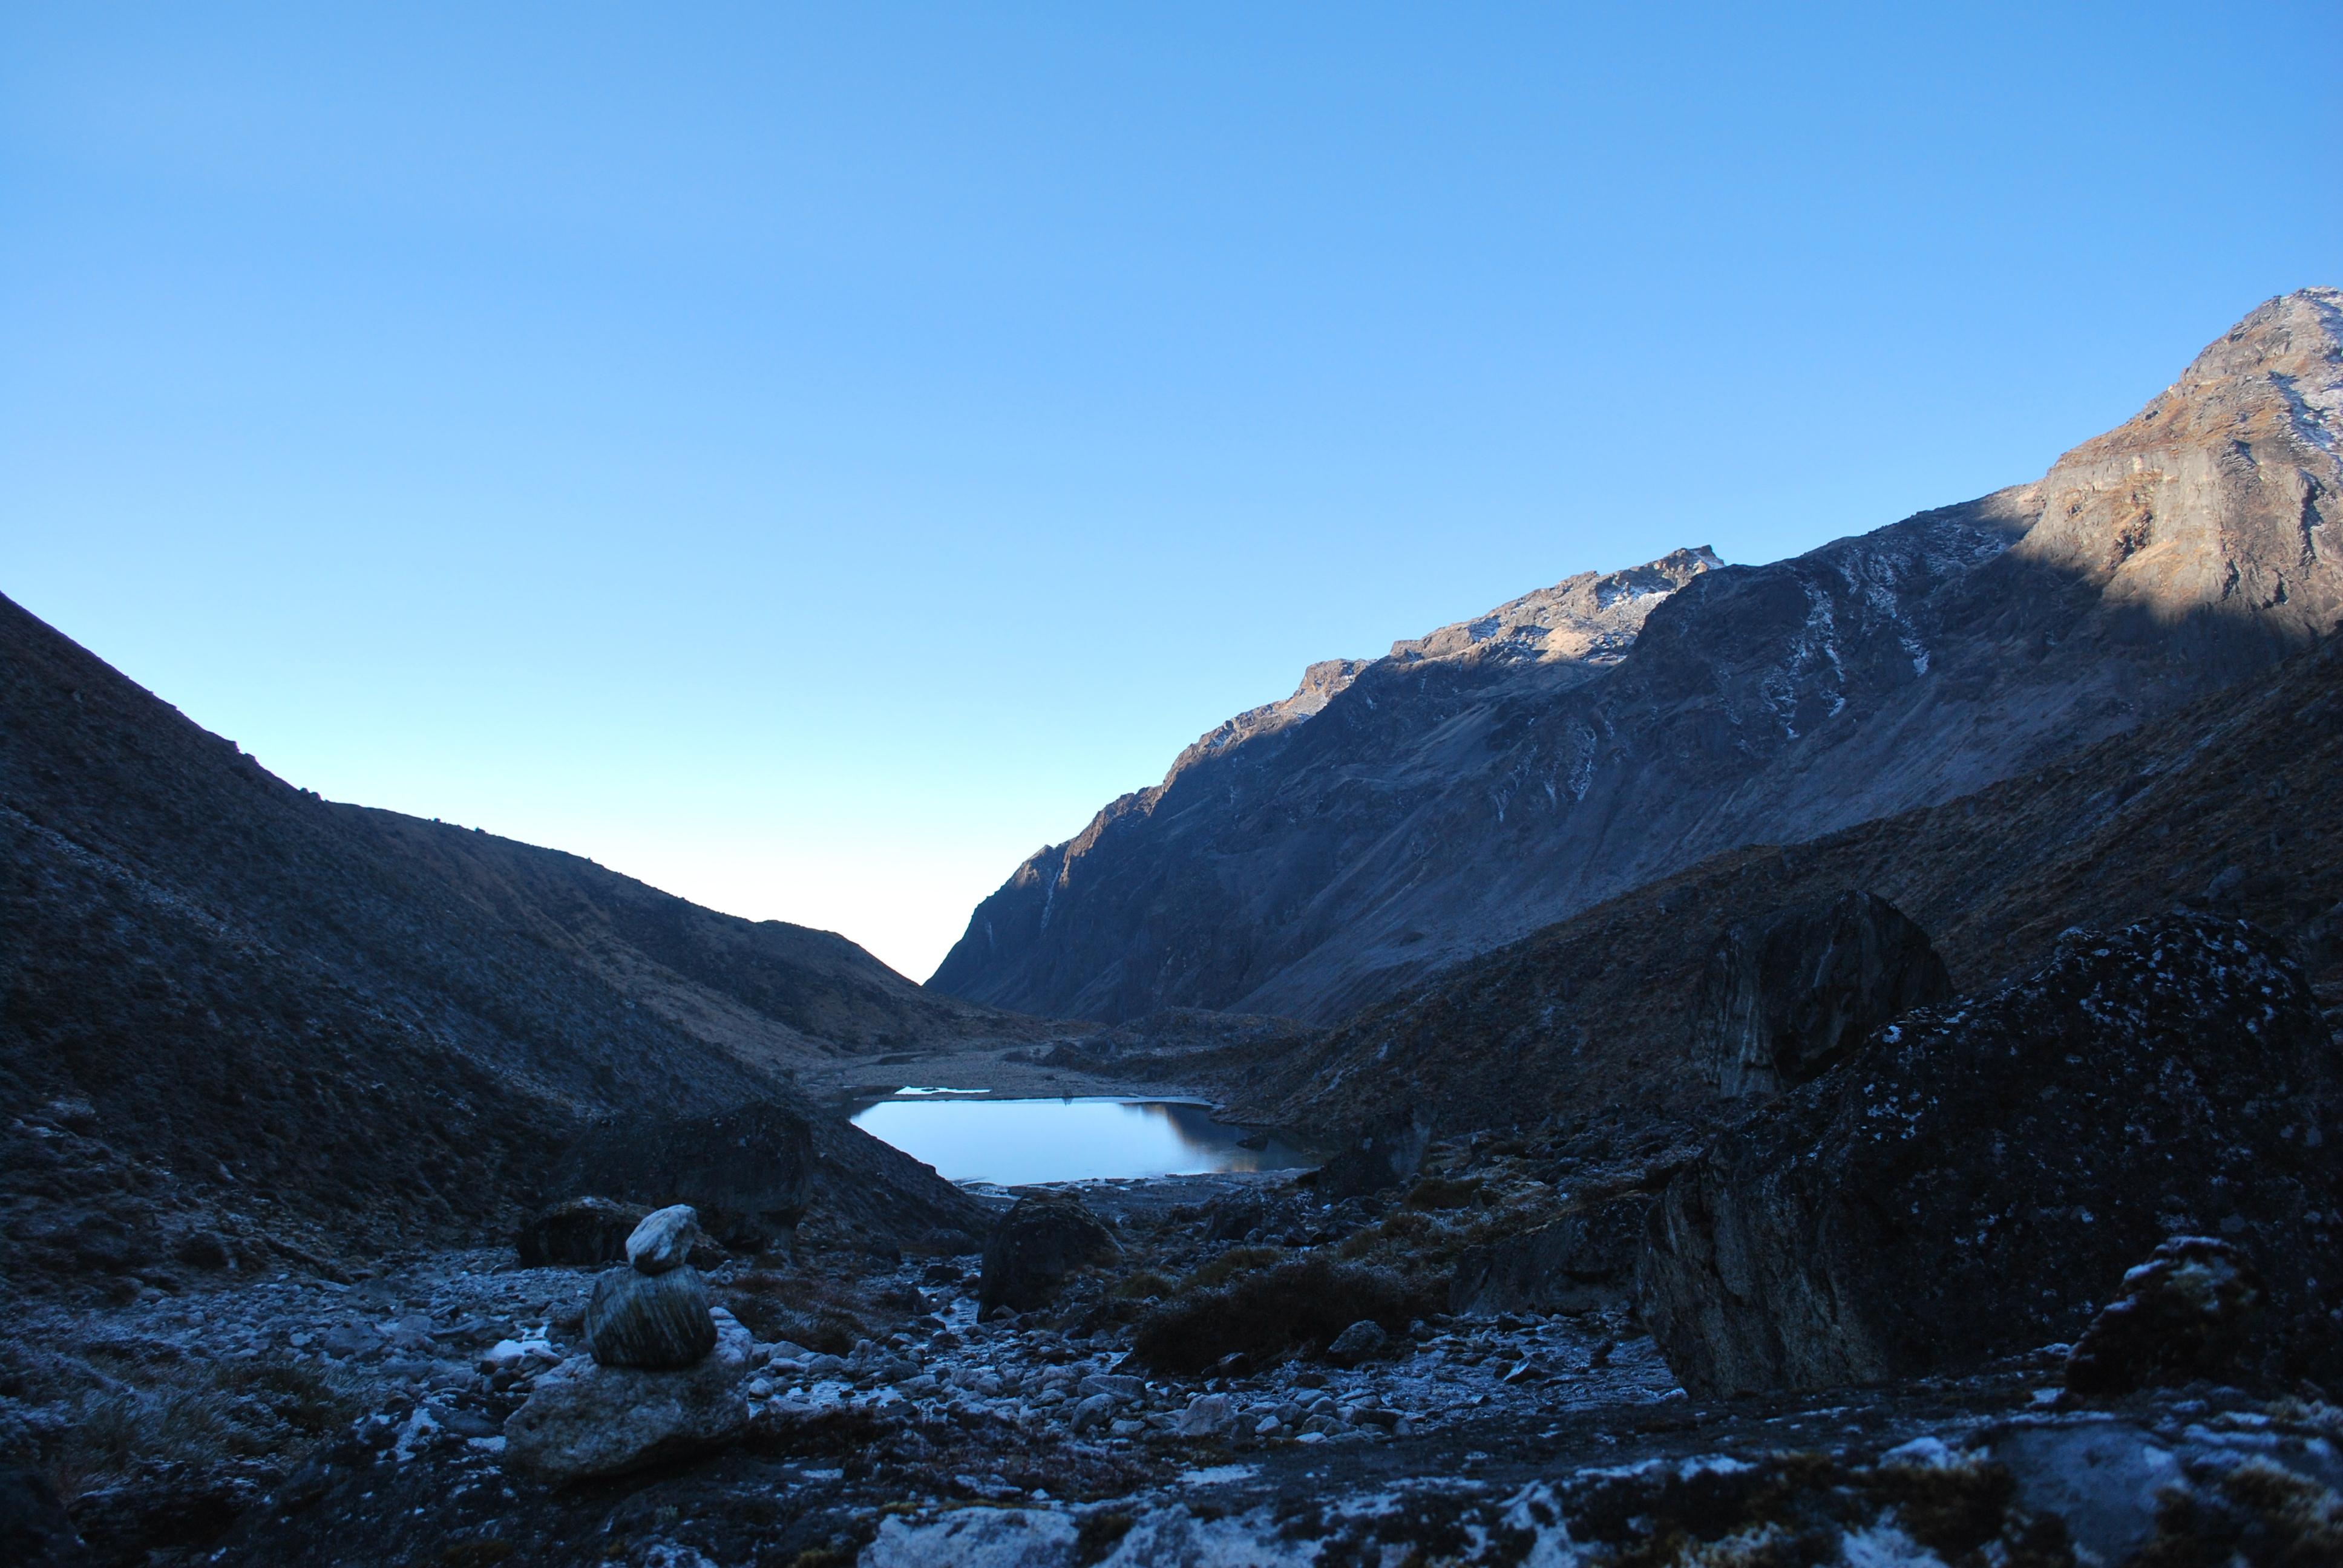 5. Tsamiti Lake 1300